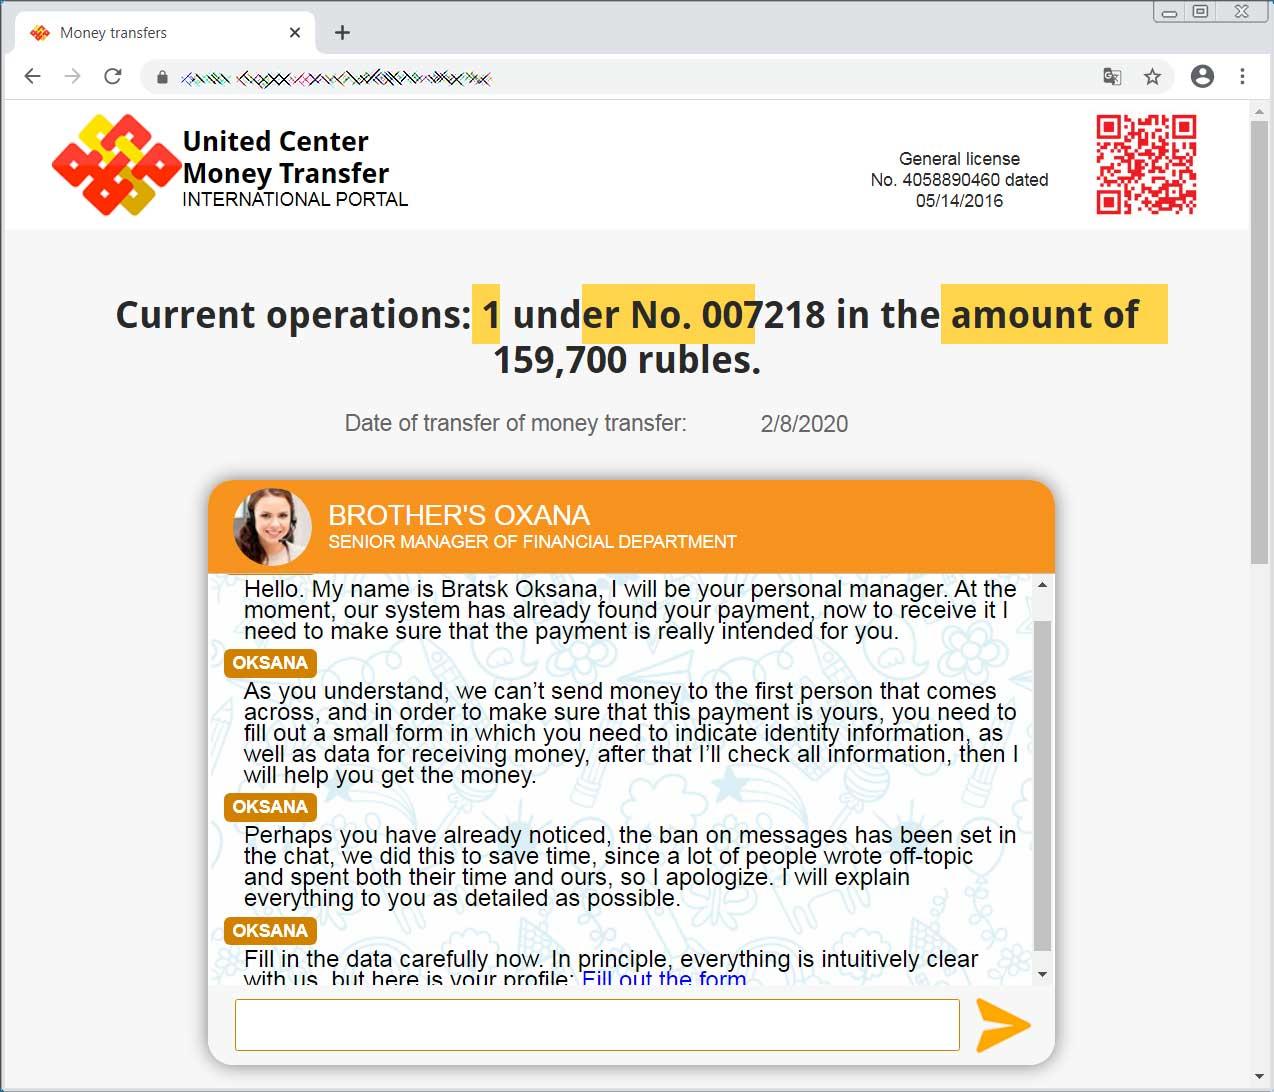 Support Represenative guiding you through phishing scam